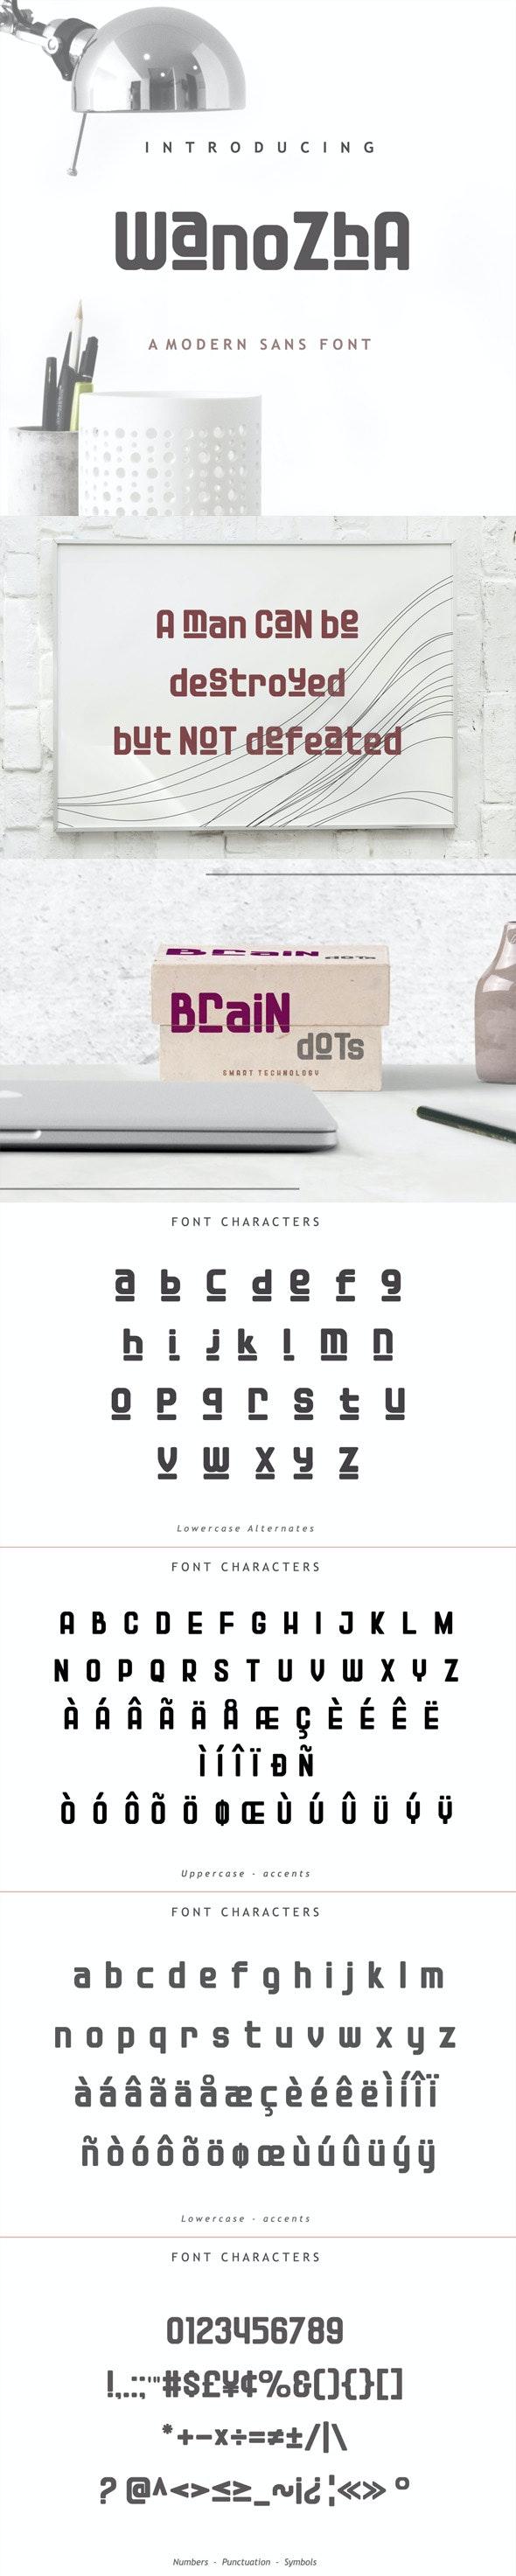 Wanozha Font - Sans-Serif Fonts